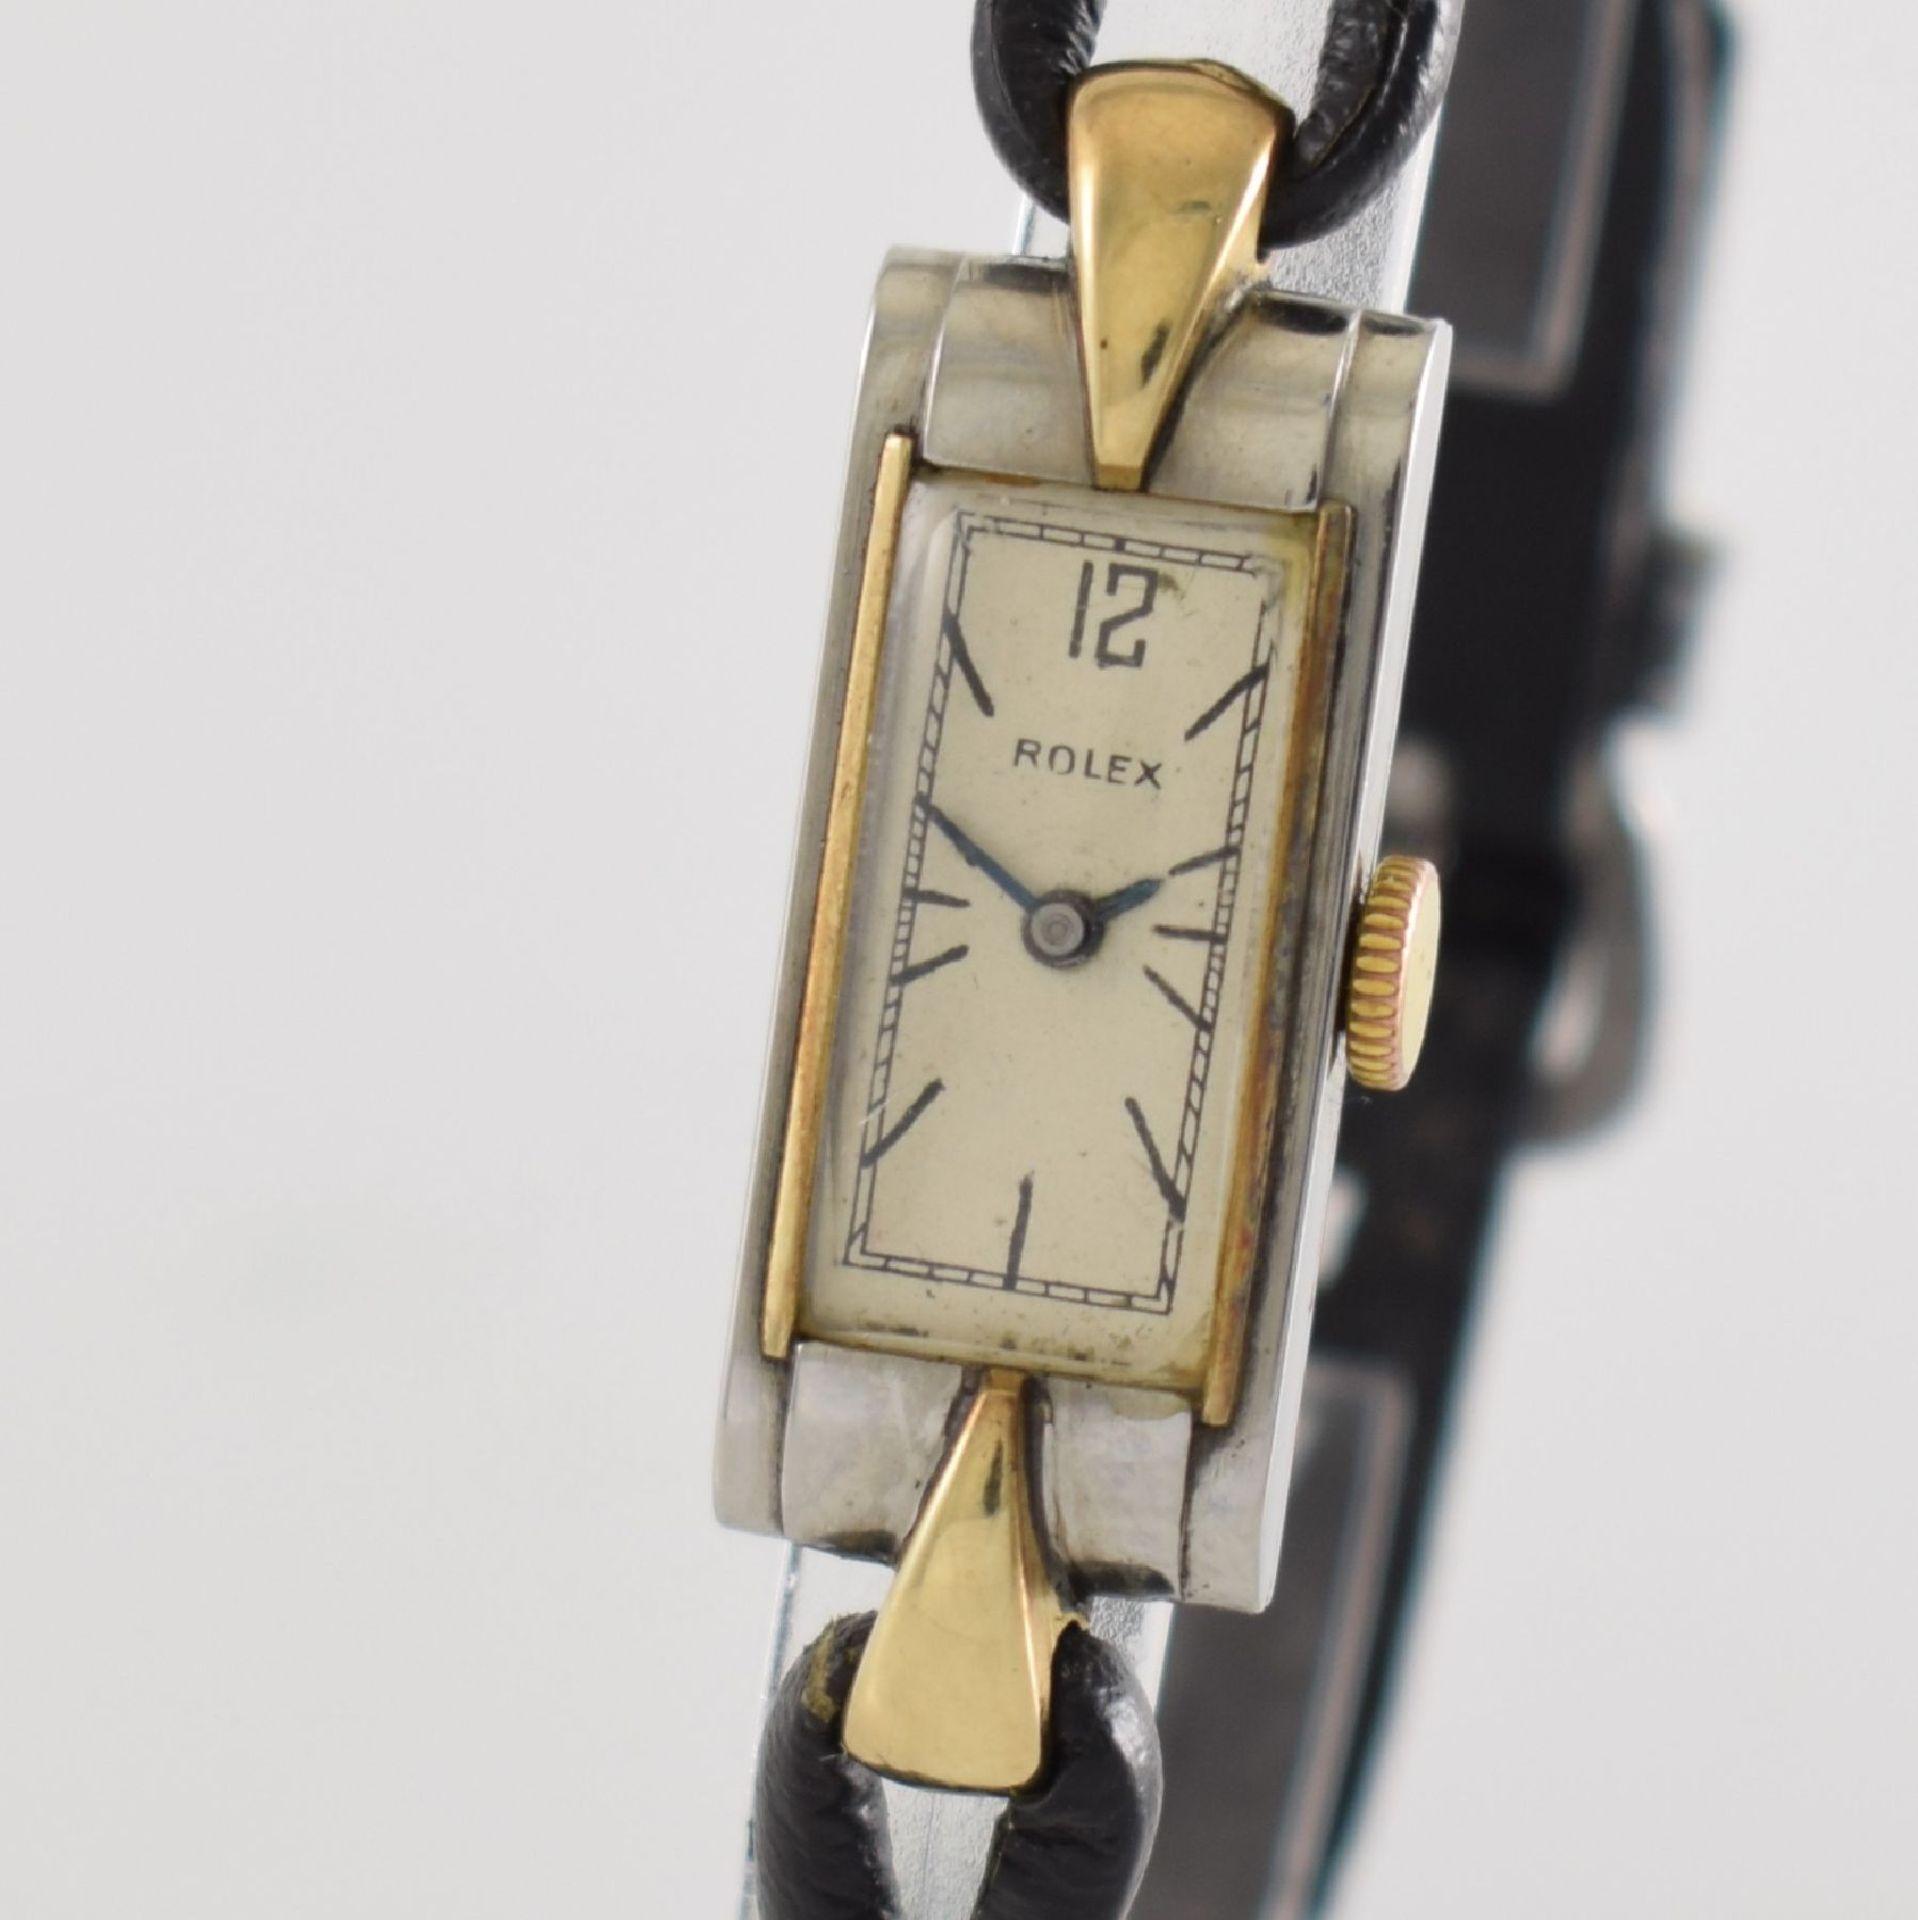 ROLEX Princess Damenarmbanduhr Ref. 1876 in Stahl/Gold, Schweiz um 1935, Handaufzug, rechteck. - Bild 4 aus 8